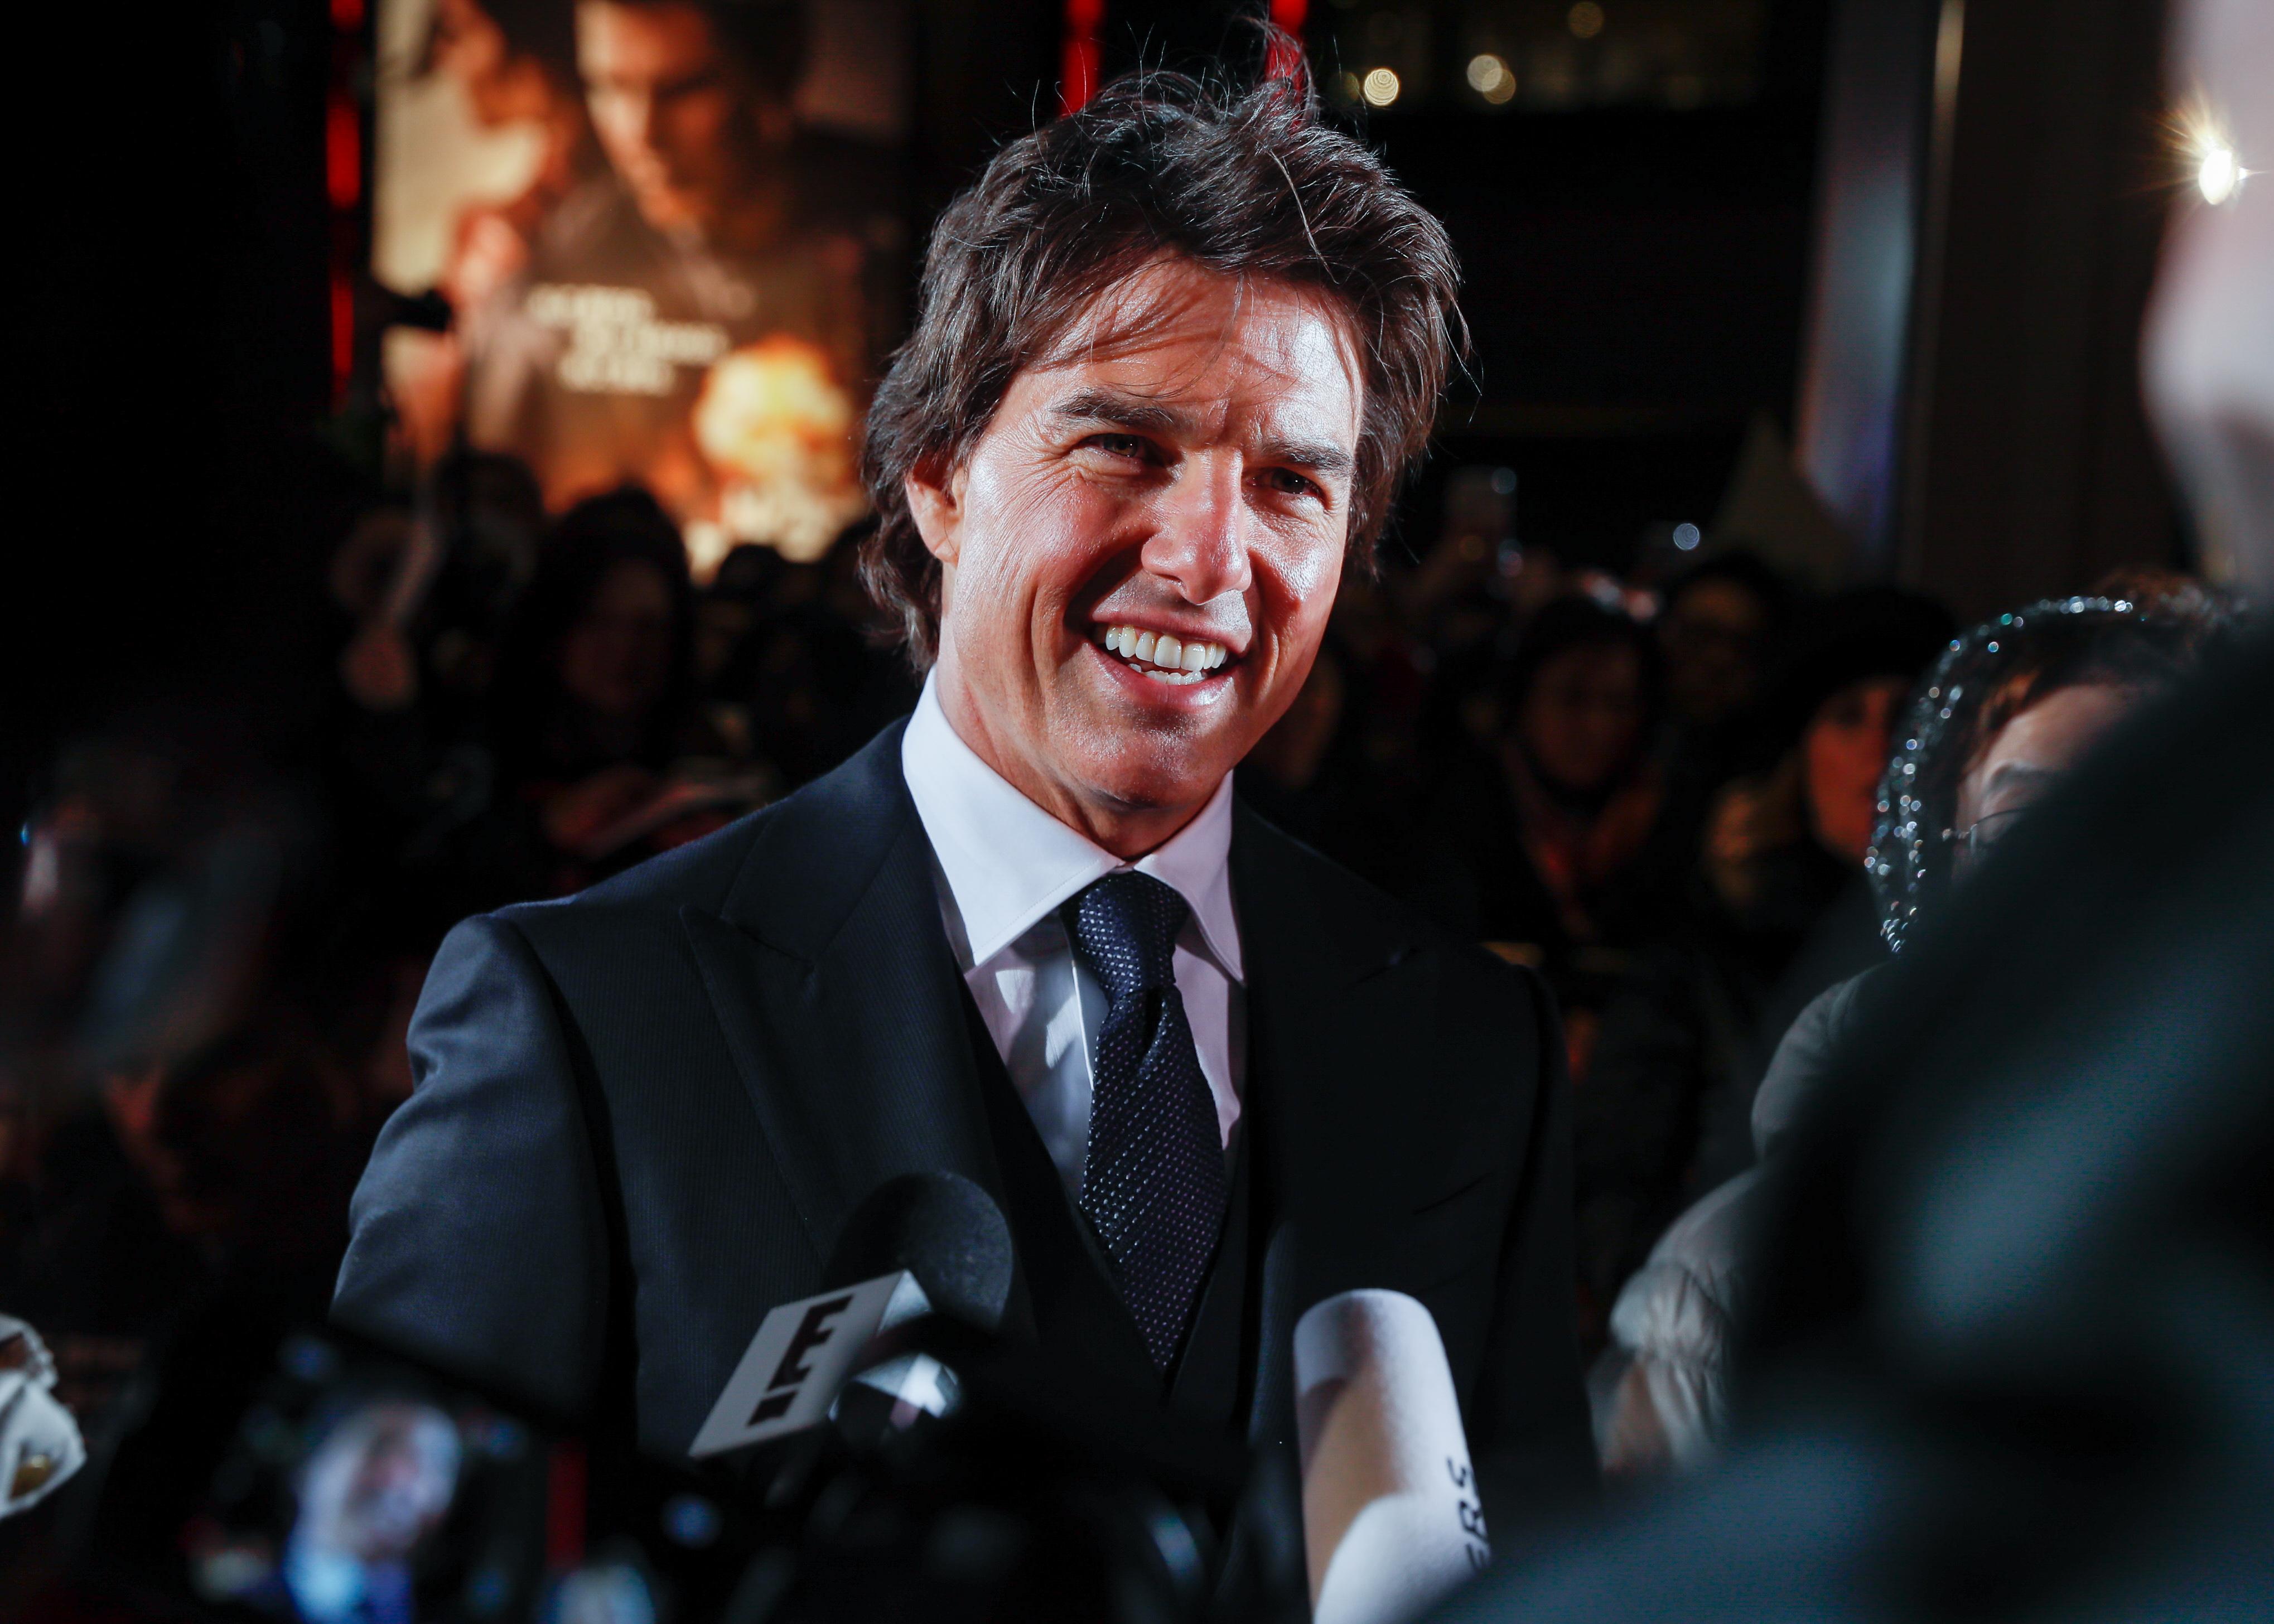 Tom Cruise, on Nov. 9, 2016 in Tokyo.